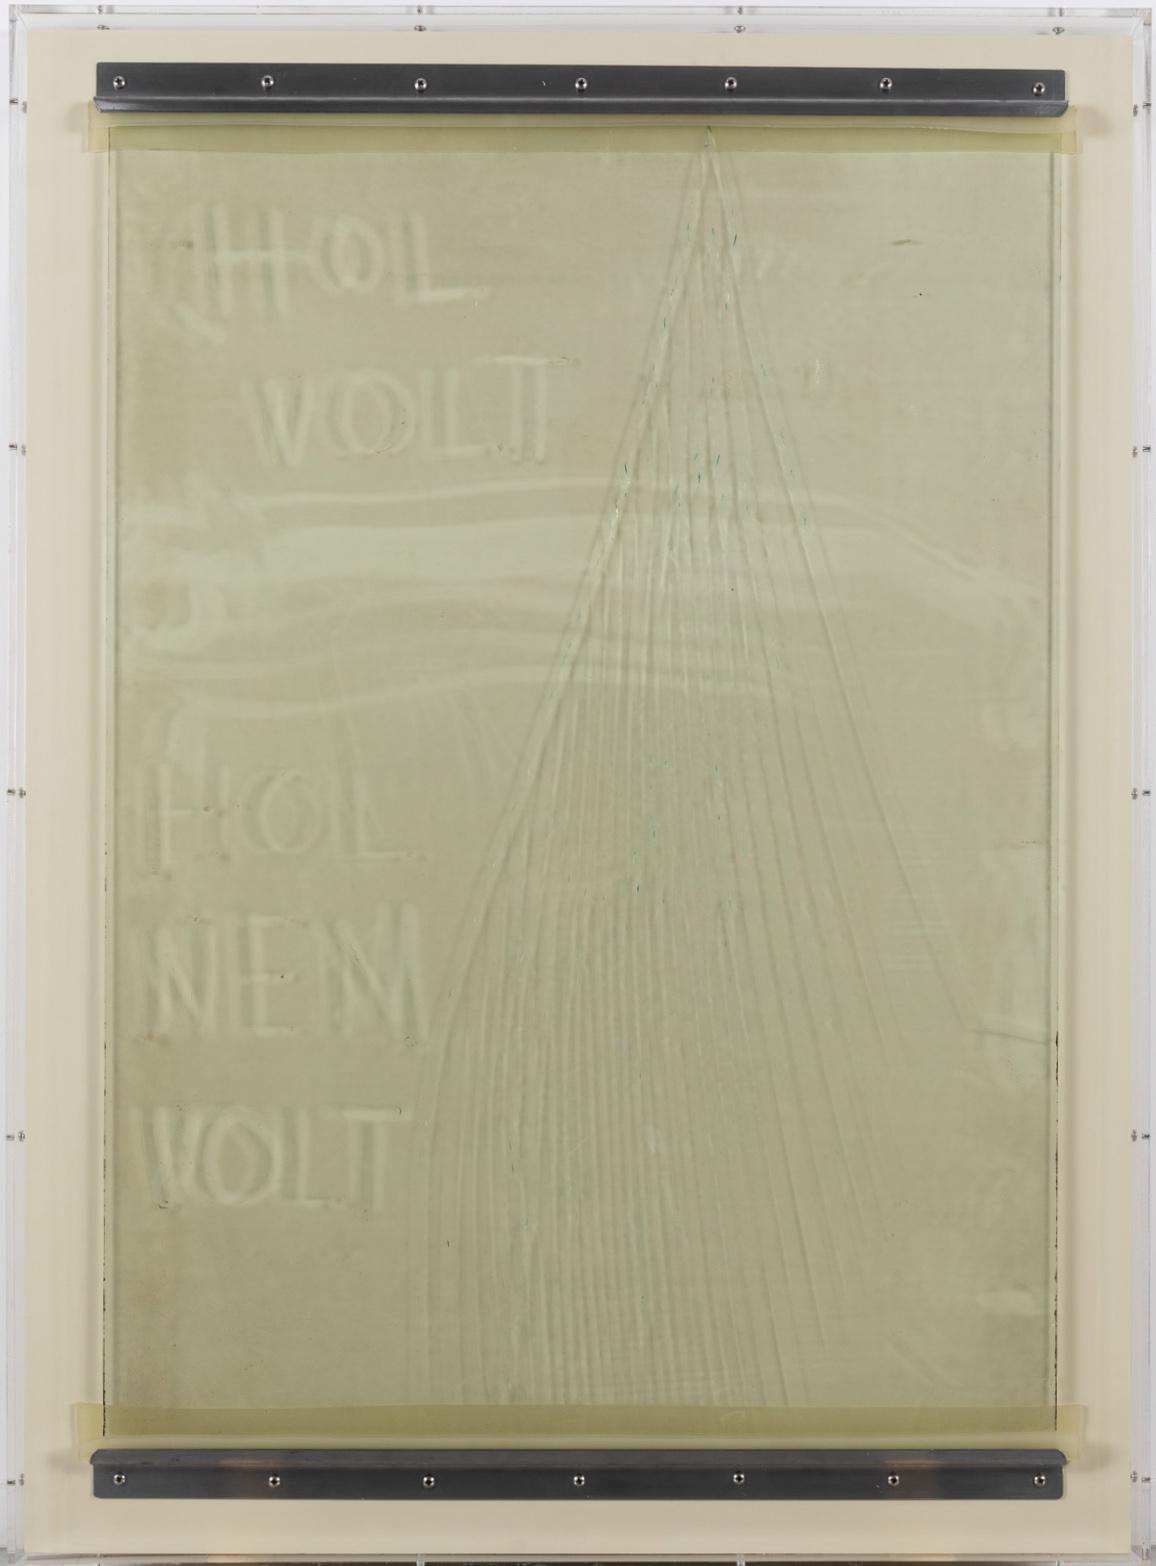 Minimal Information Hol Volt, 2020. Used glass, dust, metal fittings, rubber, in plexiglass frame, 111,5 x 81,5 x 5 cm